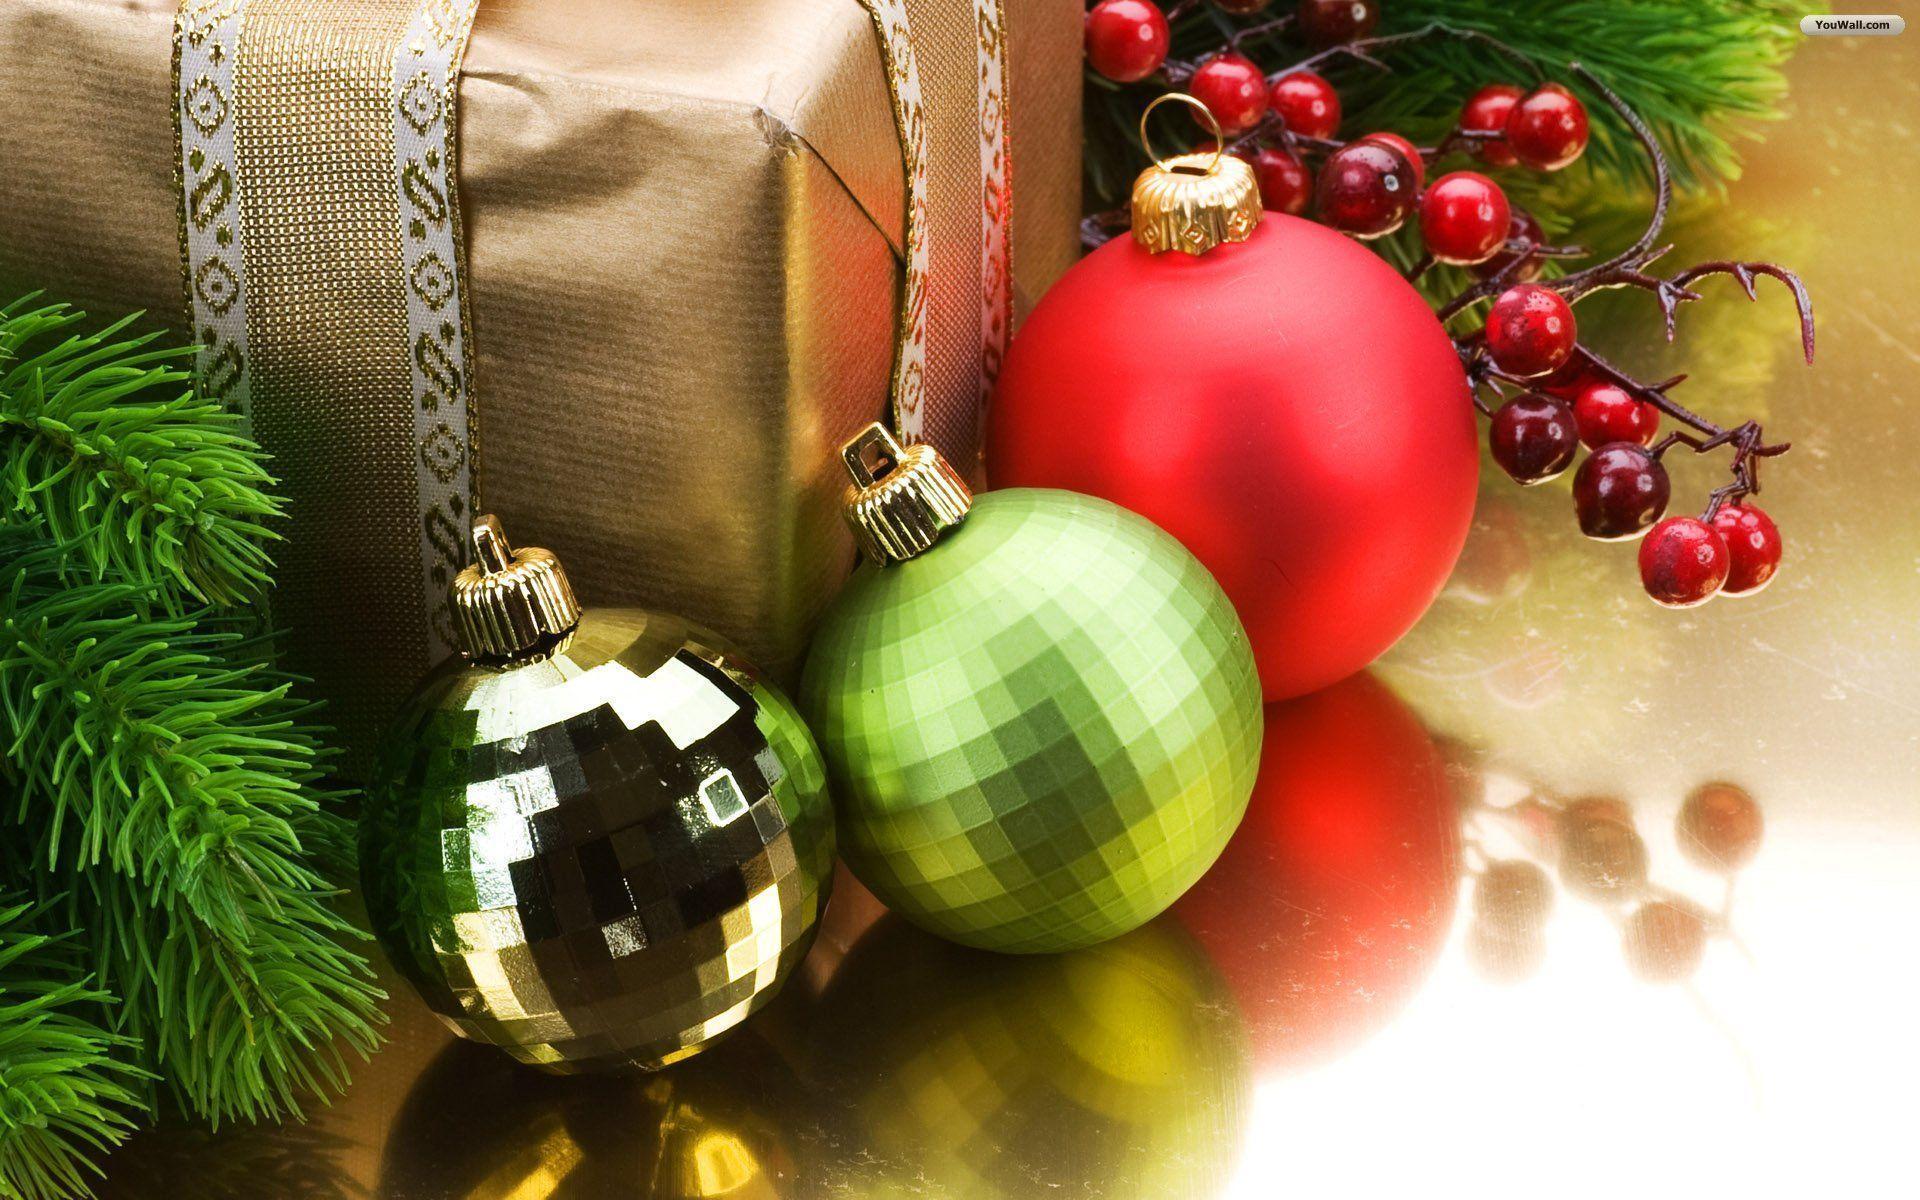 Christmas Ornaments Wallpapers - HD Wallpapers Inn